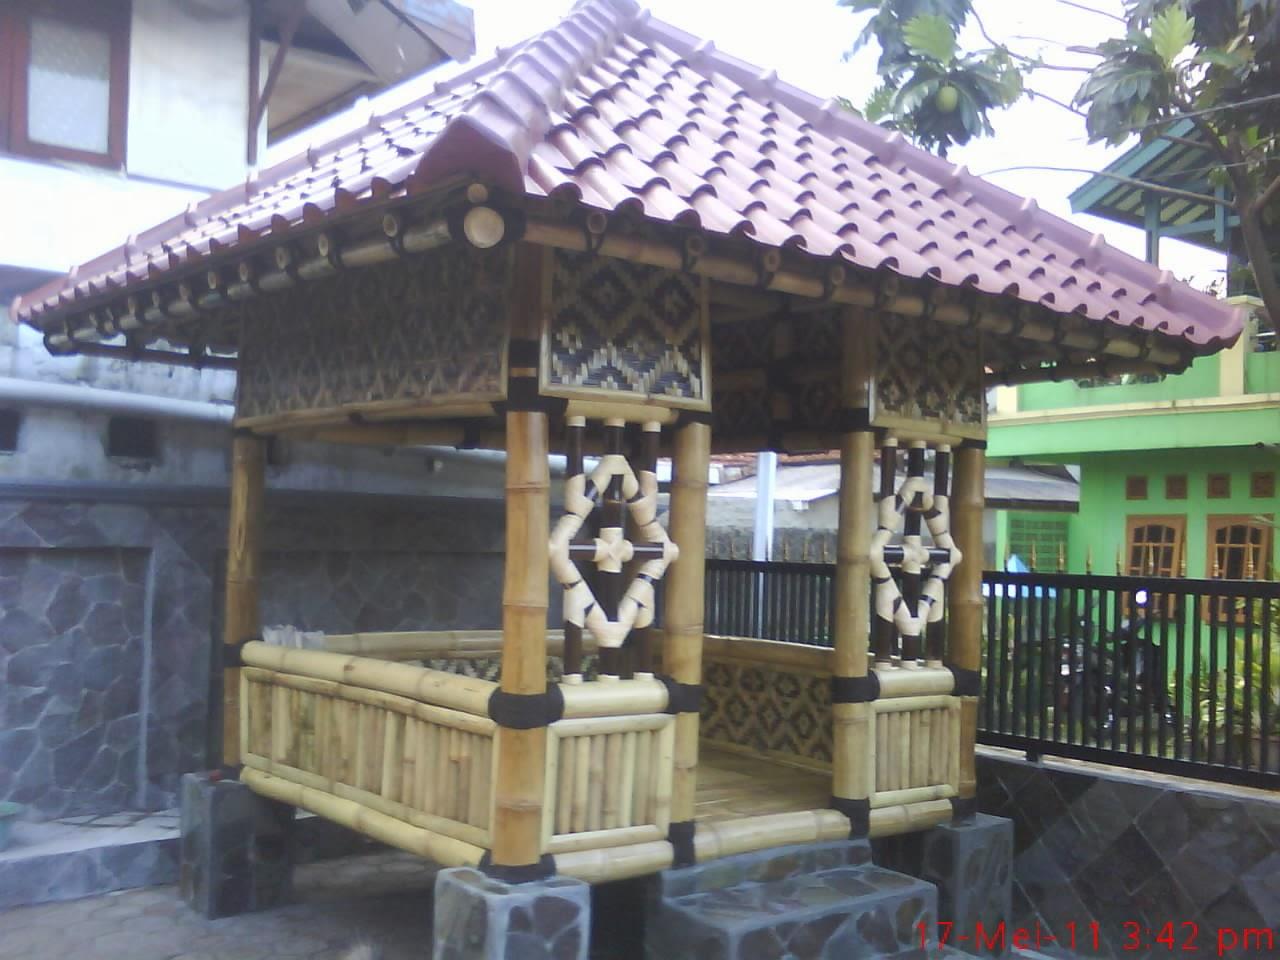 Saung-gazebo-saung bambu-atap-sirat